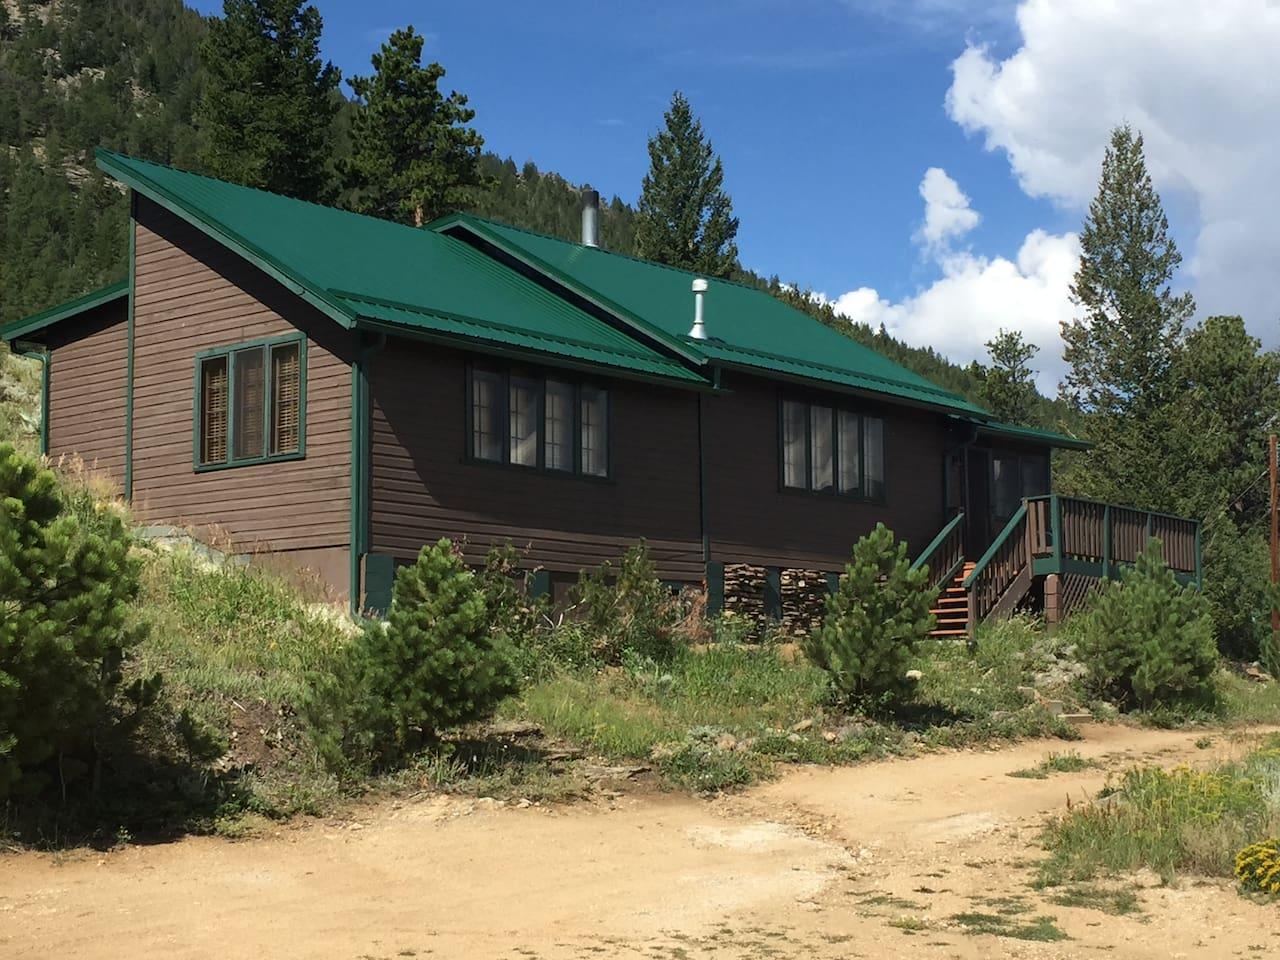 estes hotels photos aztec resort review com rentals pine cabins cabin park haven oyster